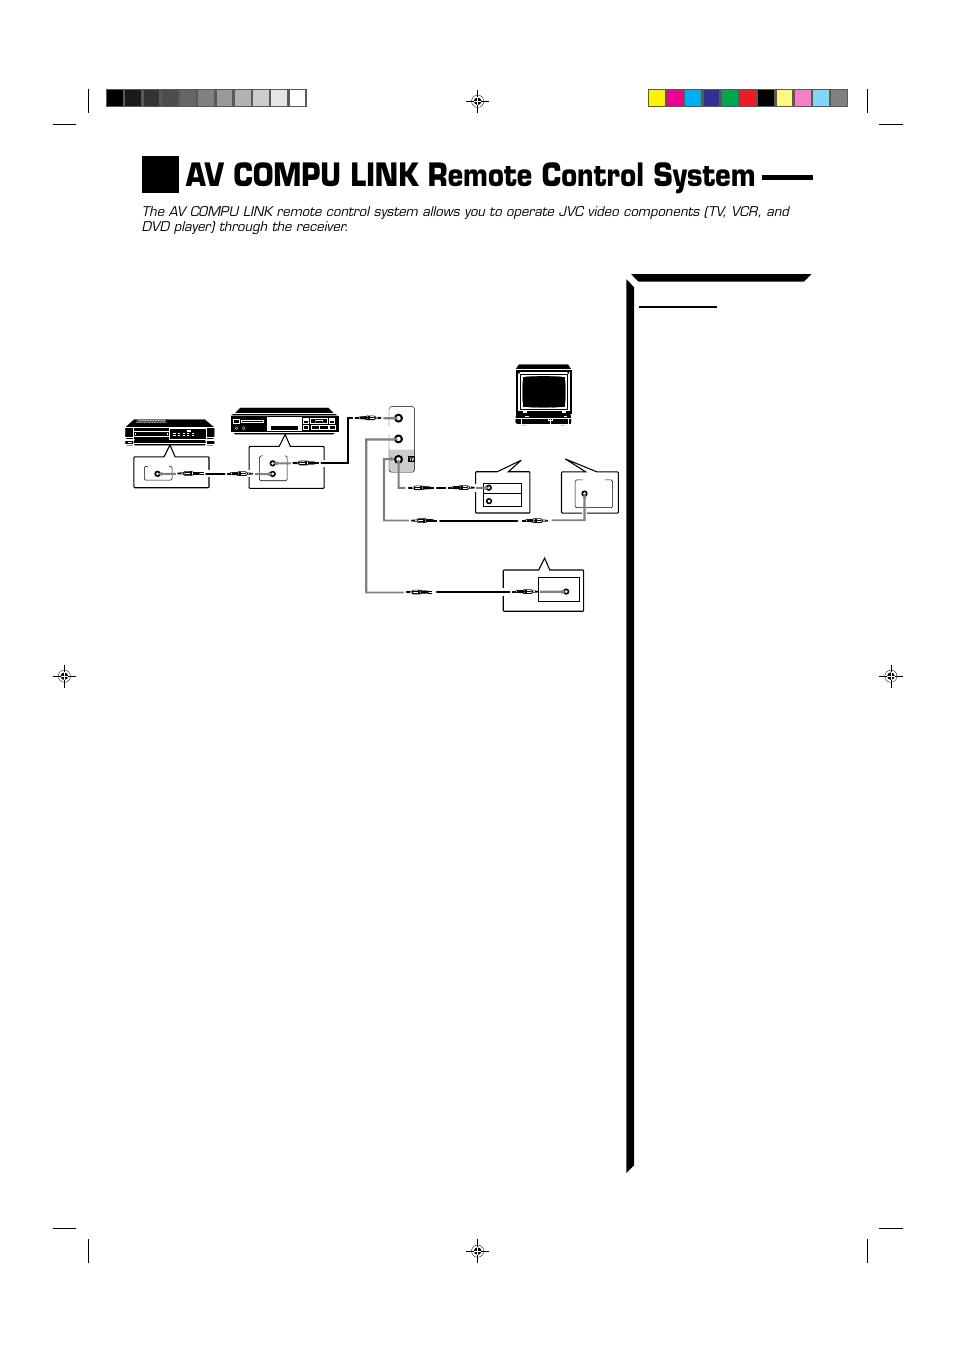 Av compu link remote control system | jvc rx-664vbk user manual.